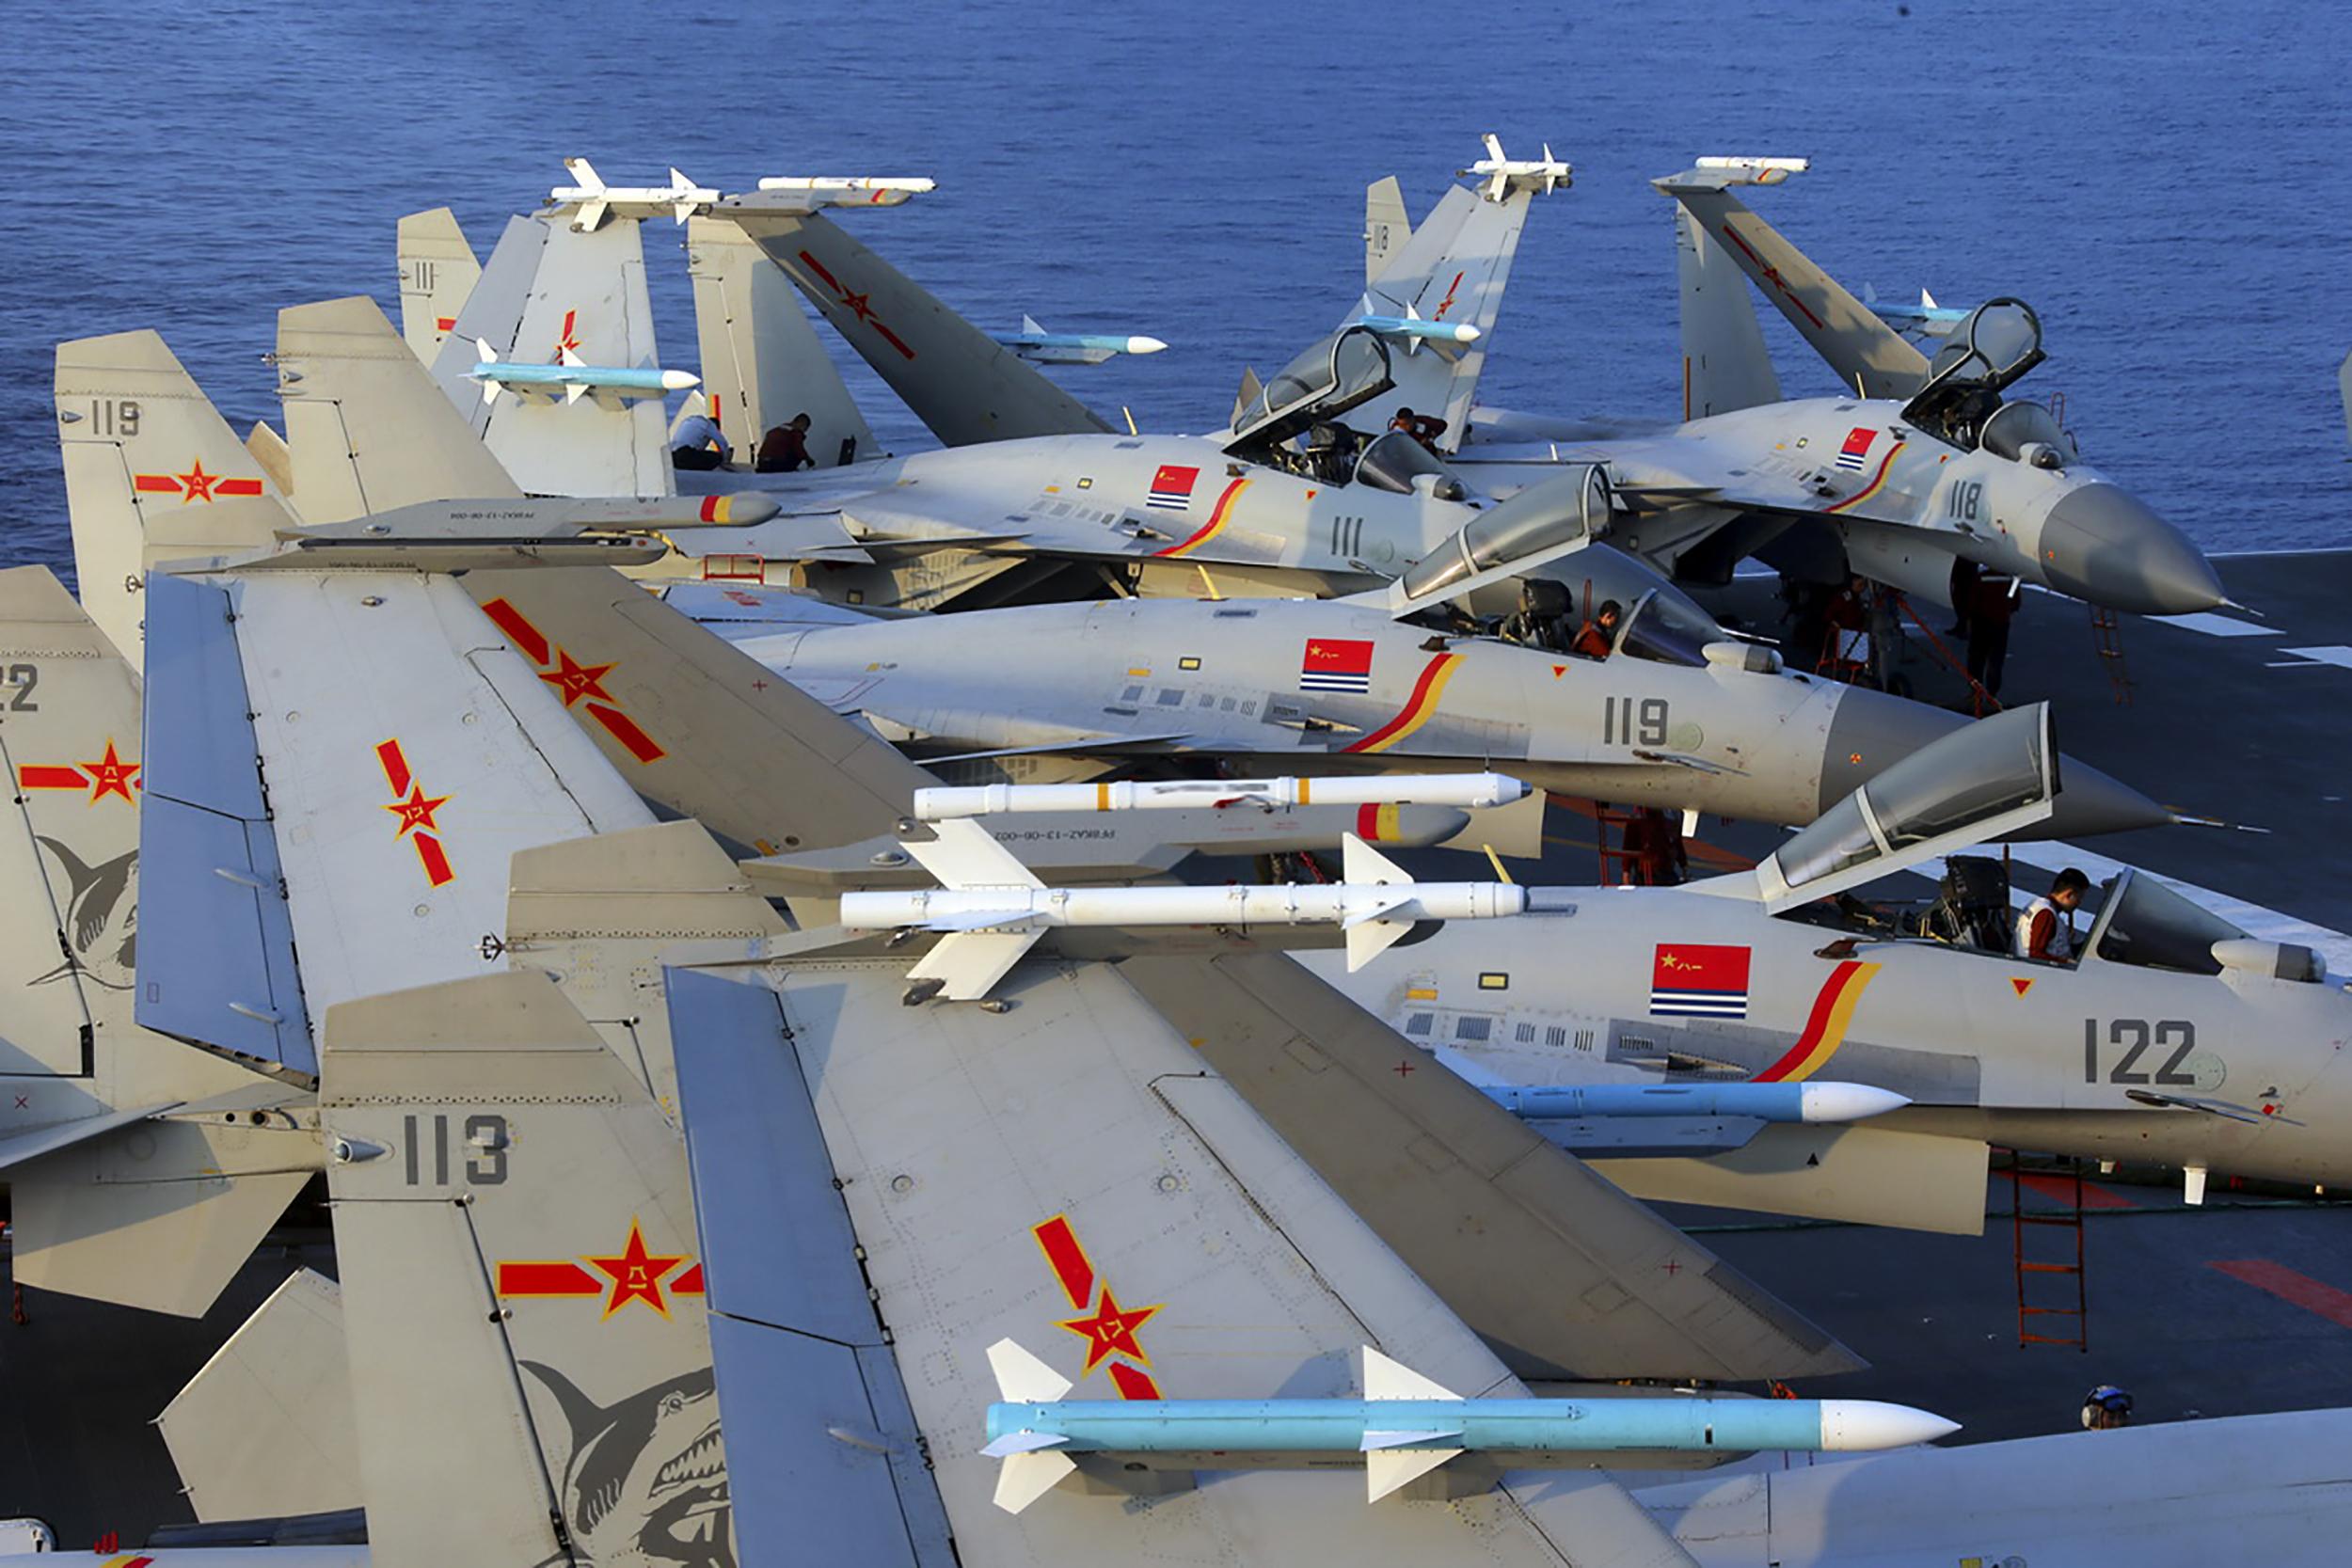 China military planes